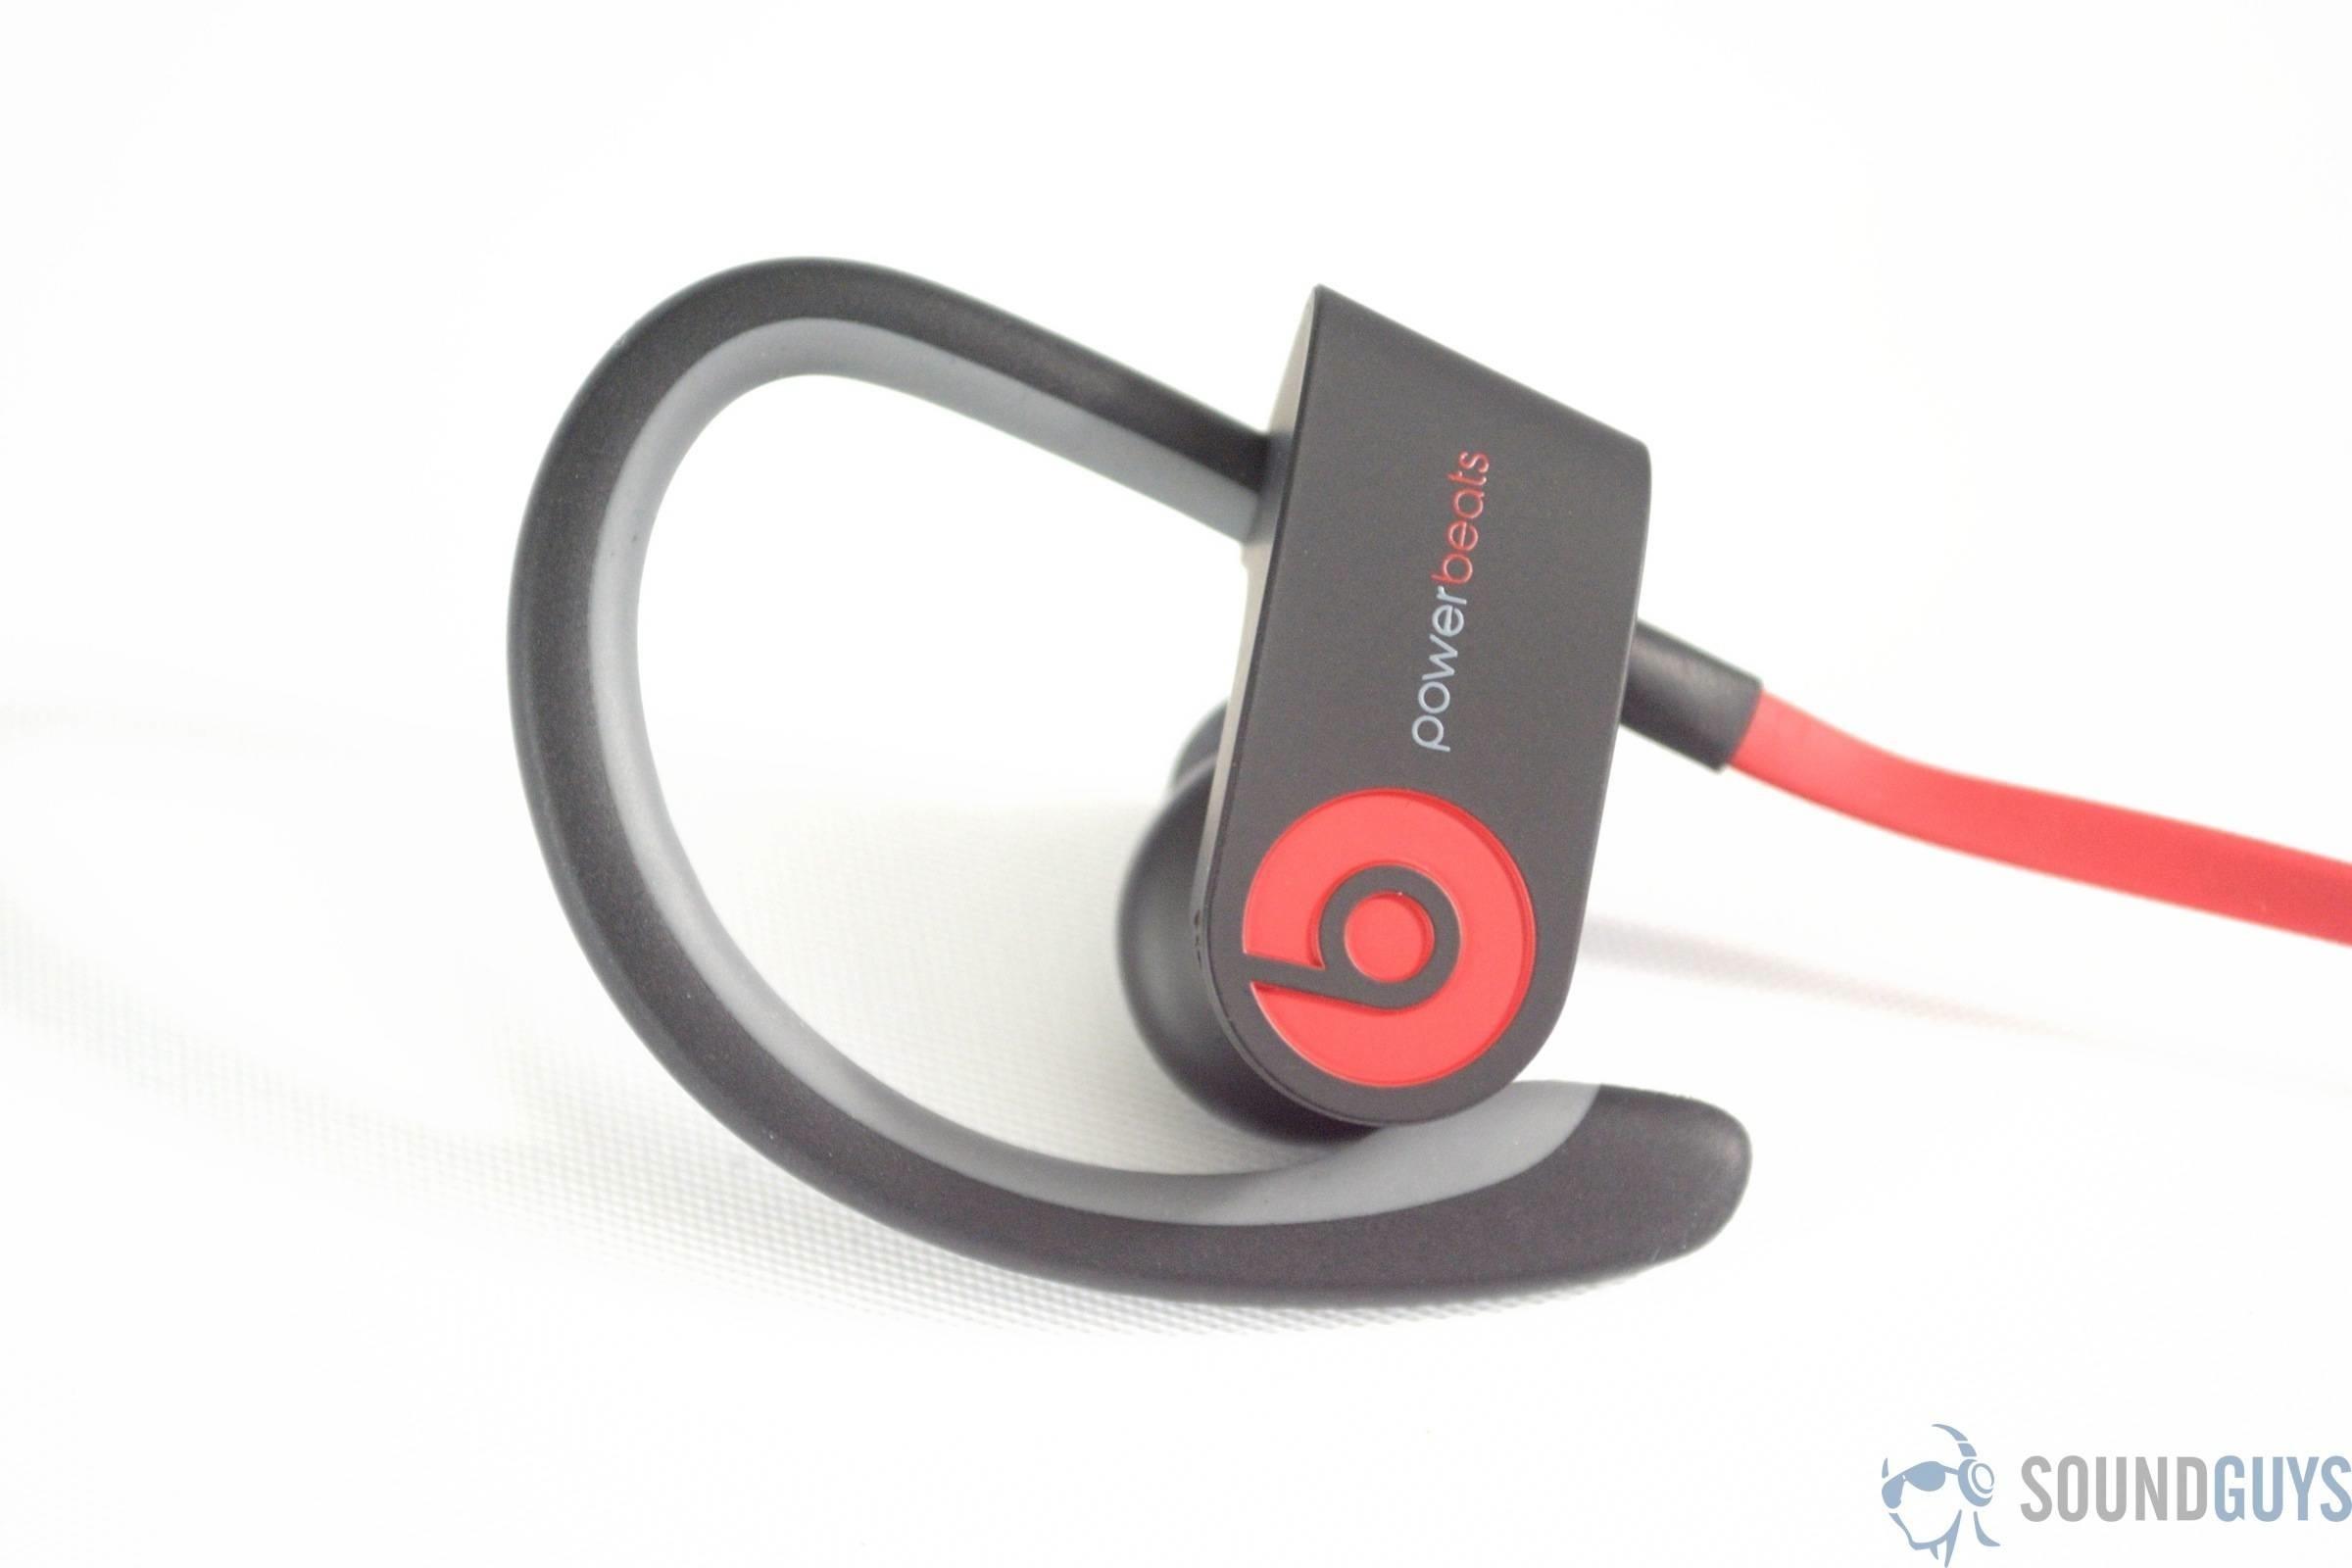 Beats Powerbeats2 Review